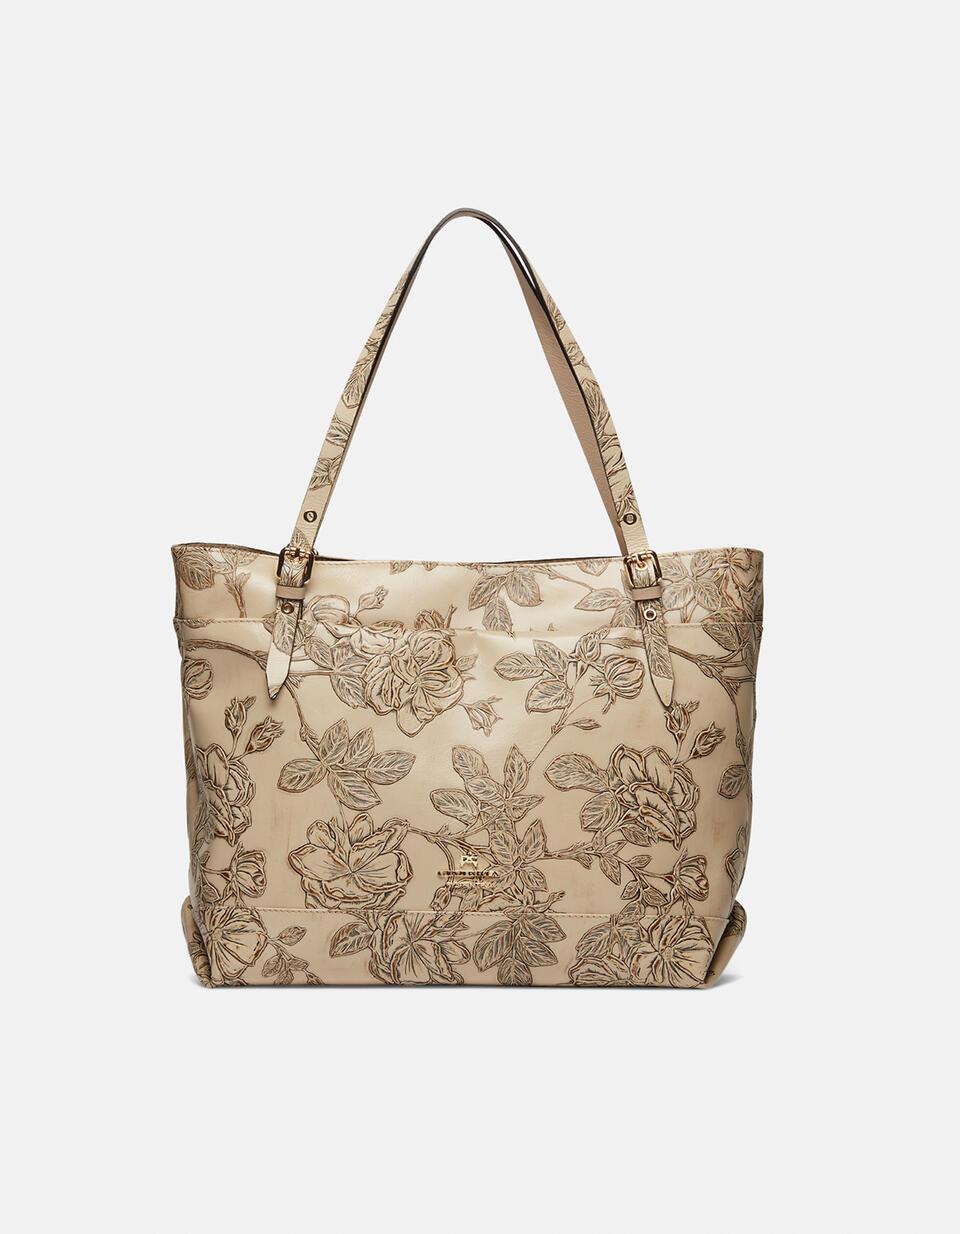 Big Mimì shopping bag keystone design Mimì TAUPE Cuoieria Fiorentina